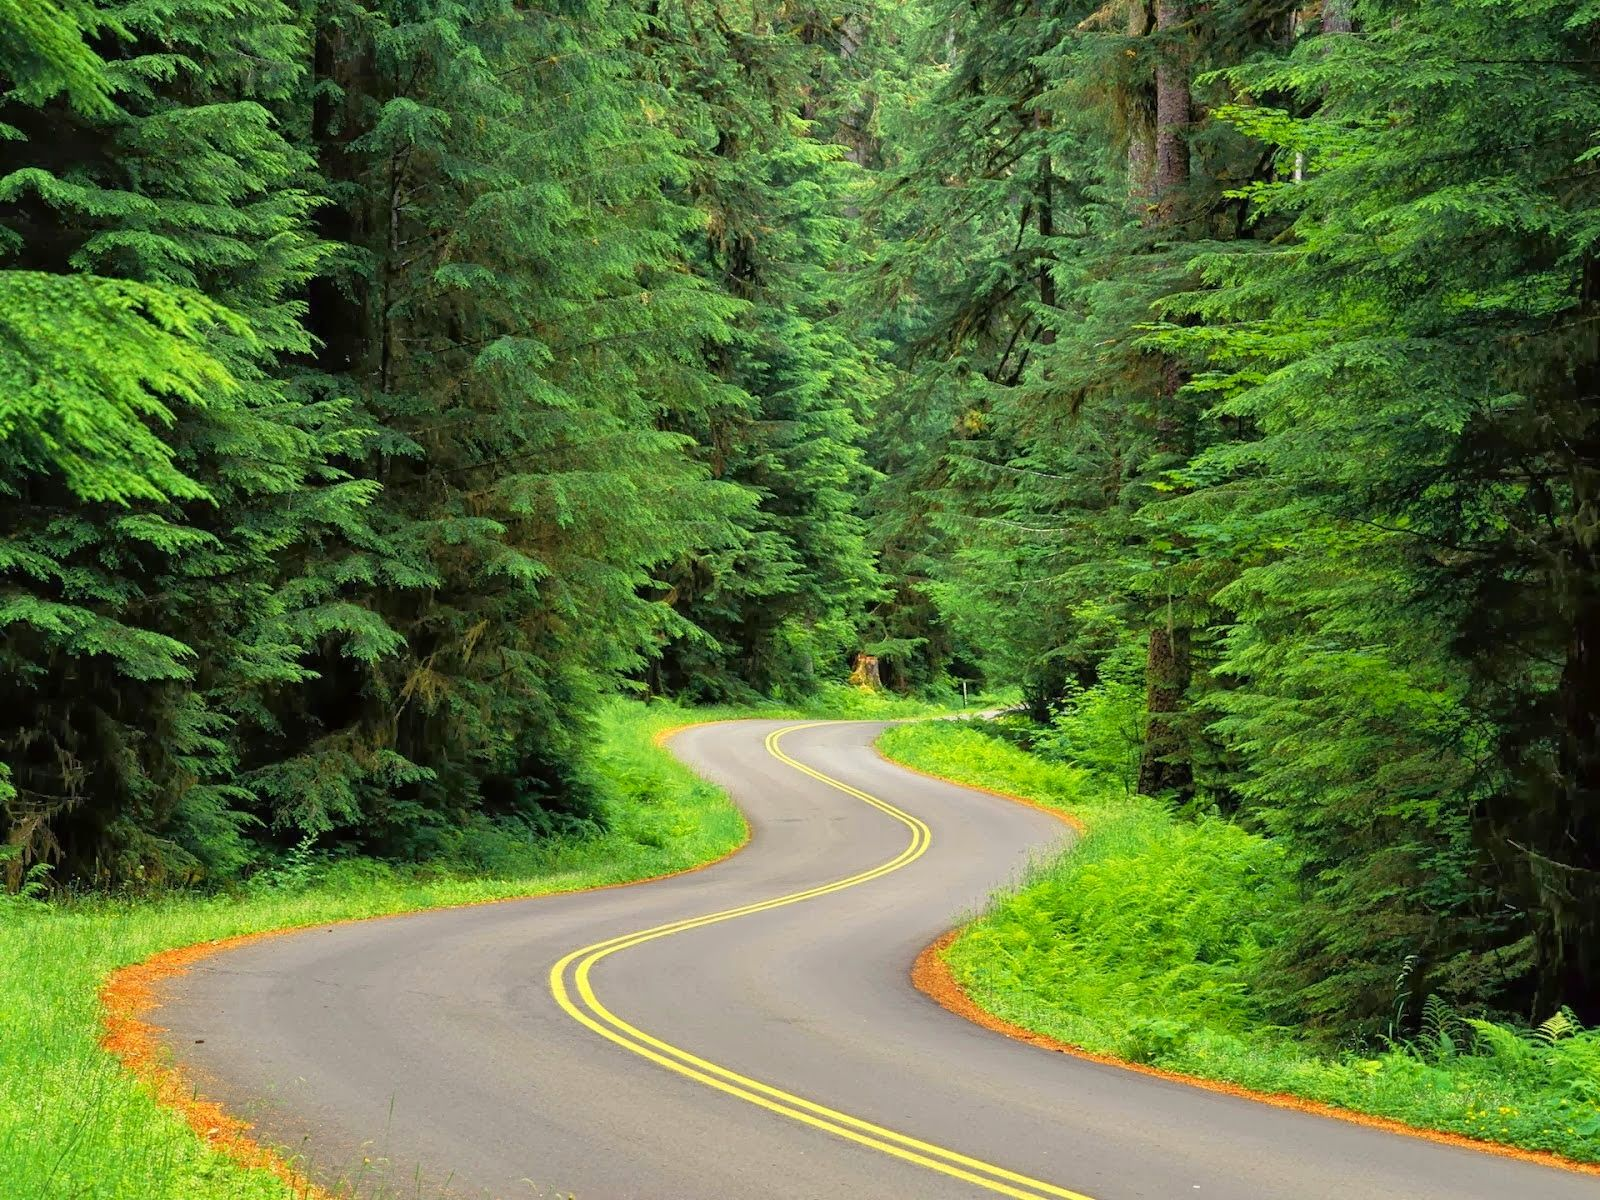 beautiful nature hd wallpapers full,green,natural landscape,road,tree,vegetation